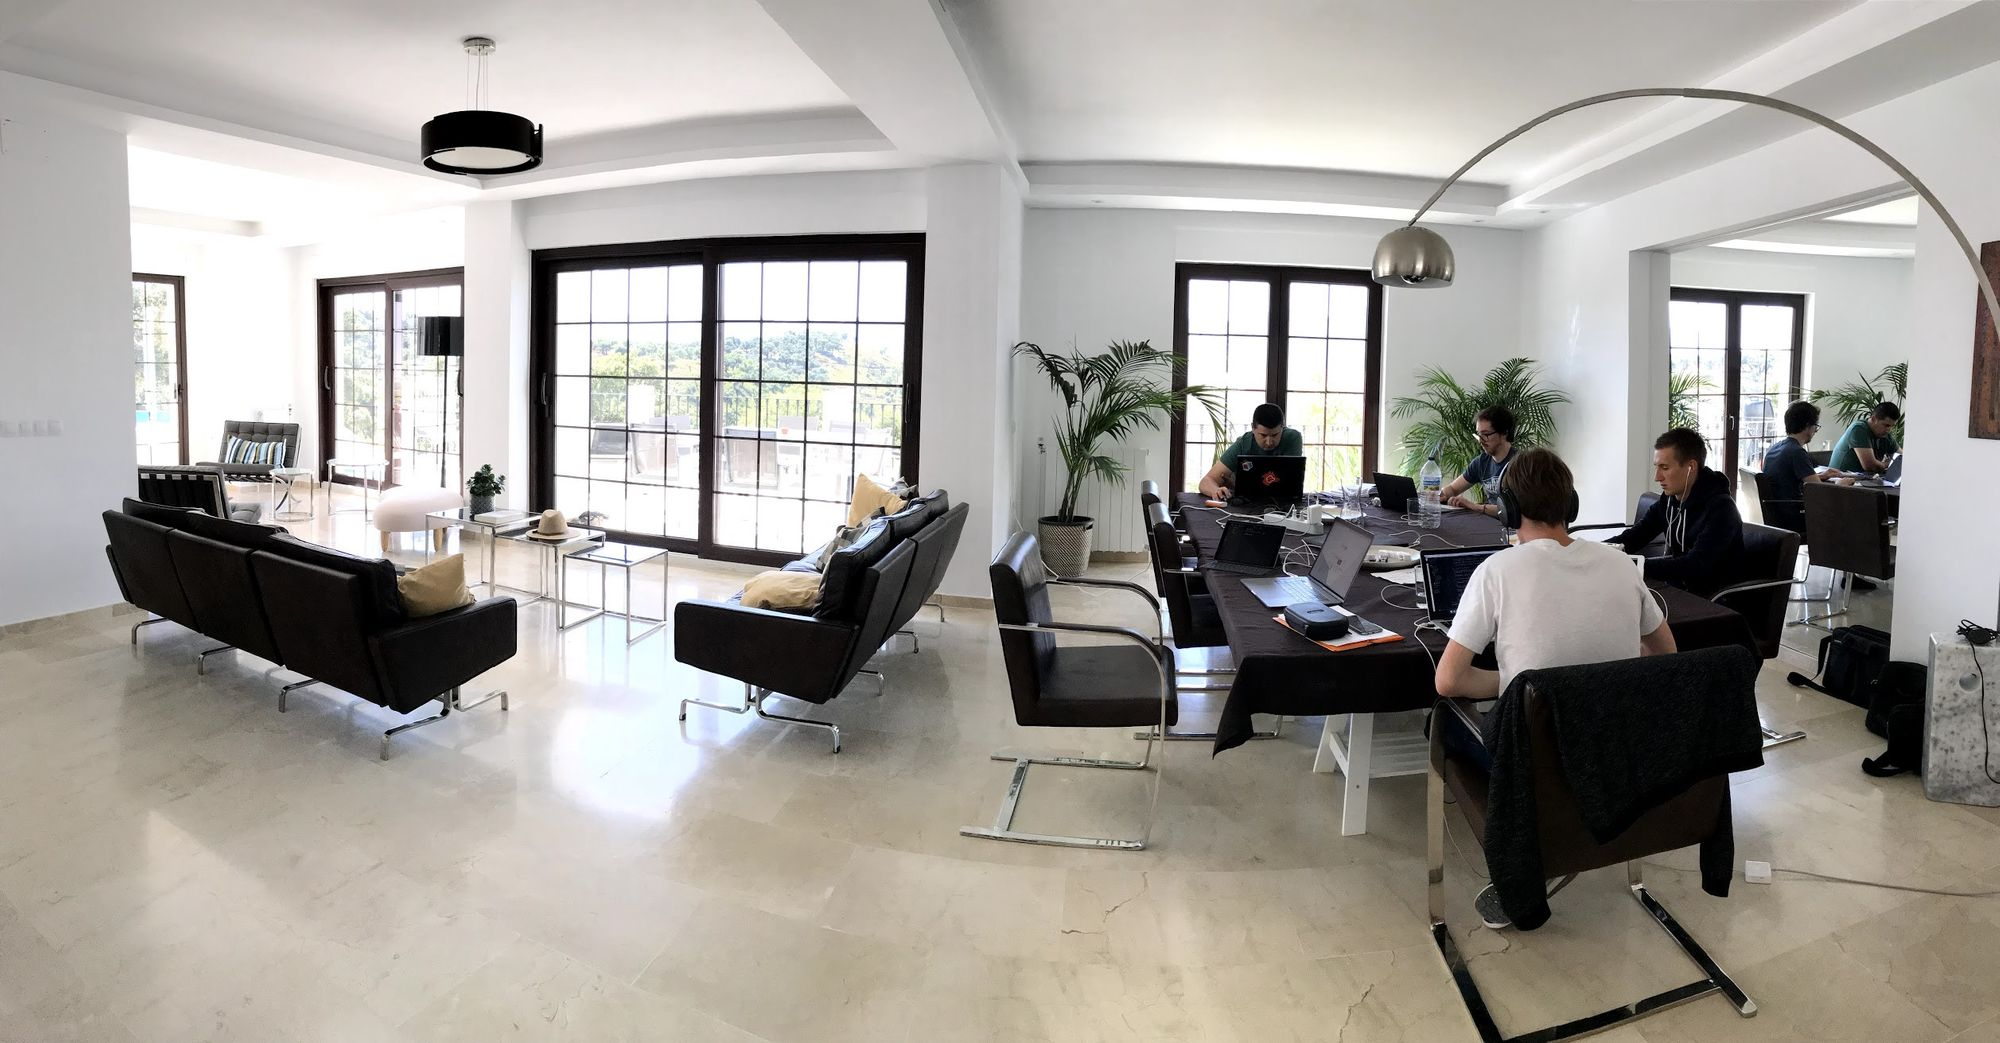 Company retreat in Spain